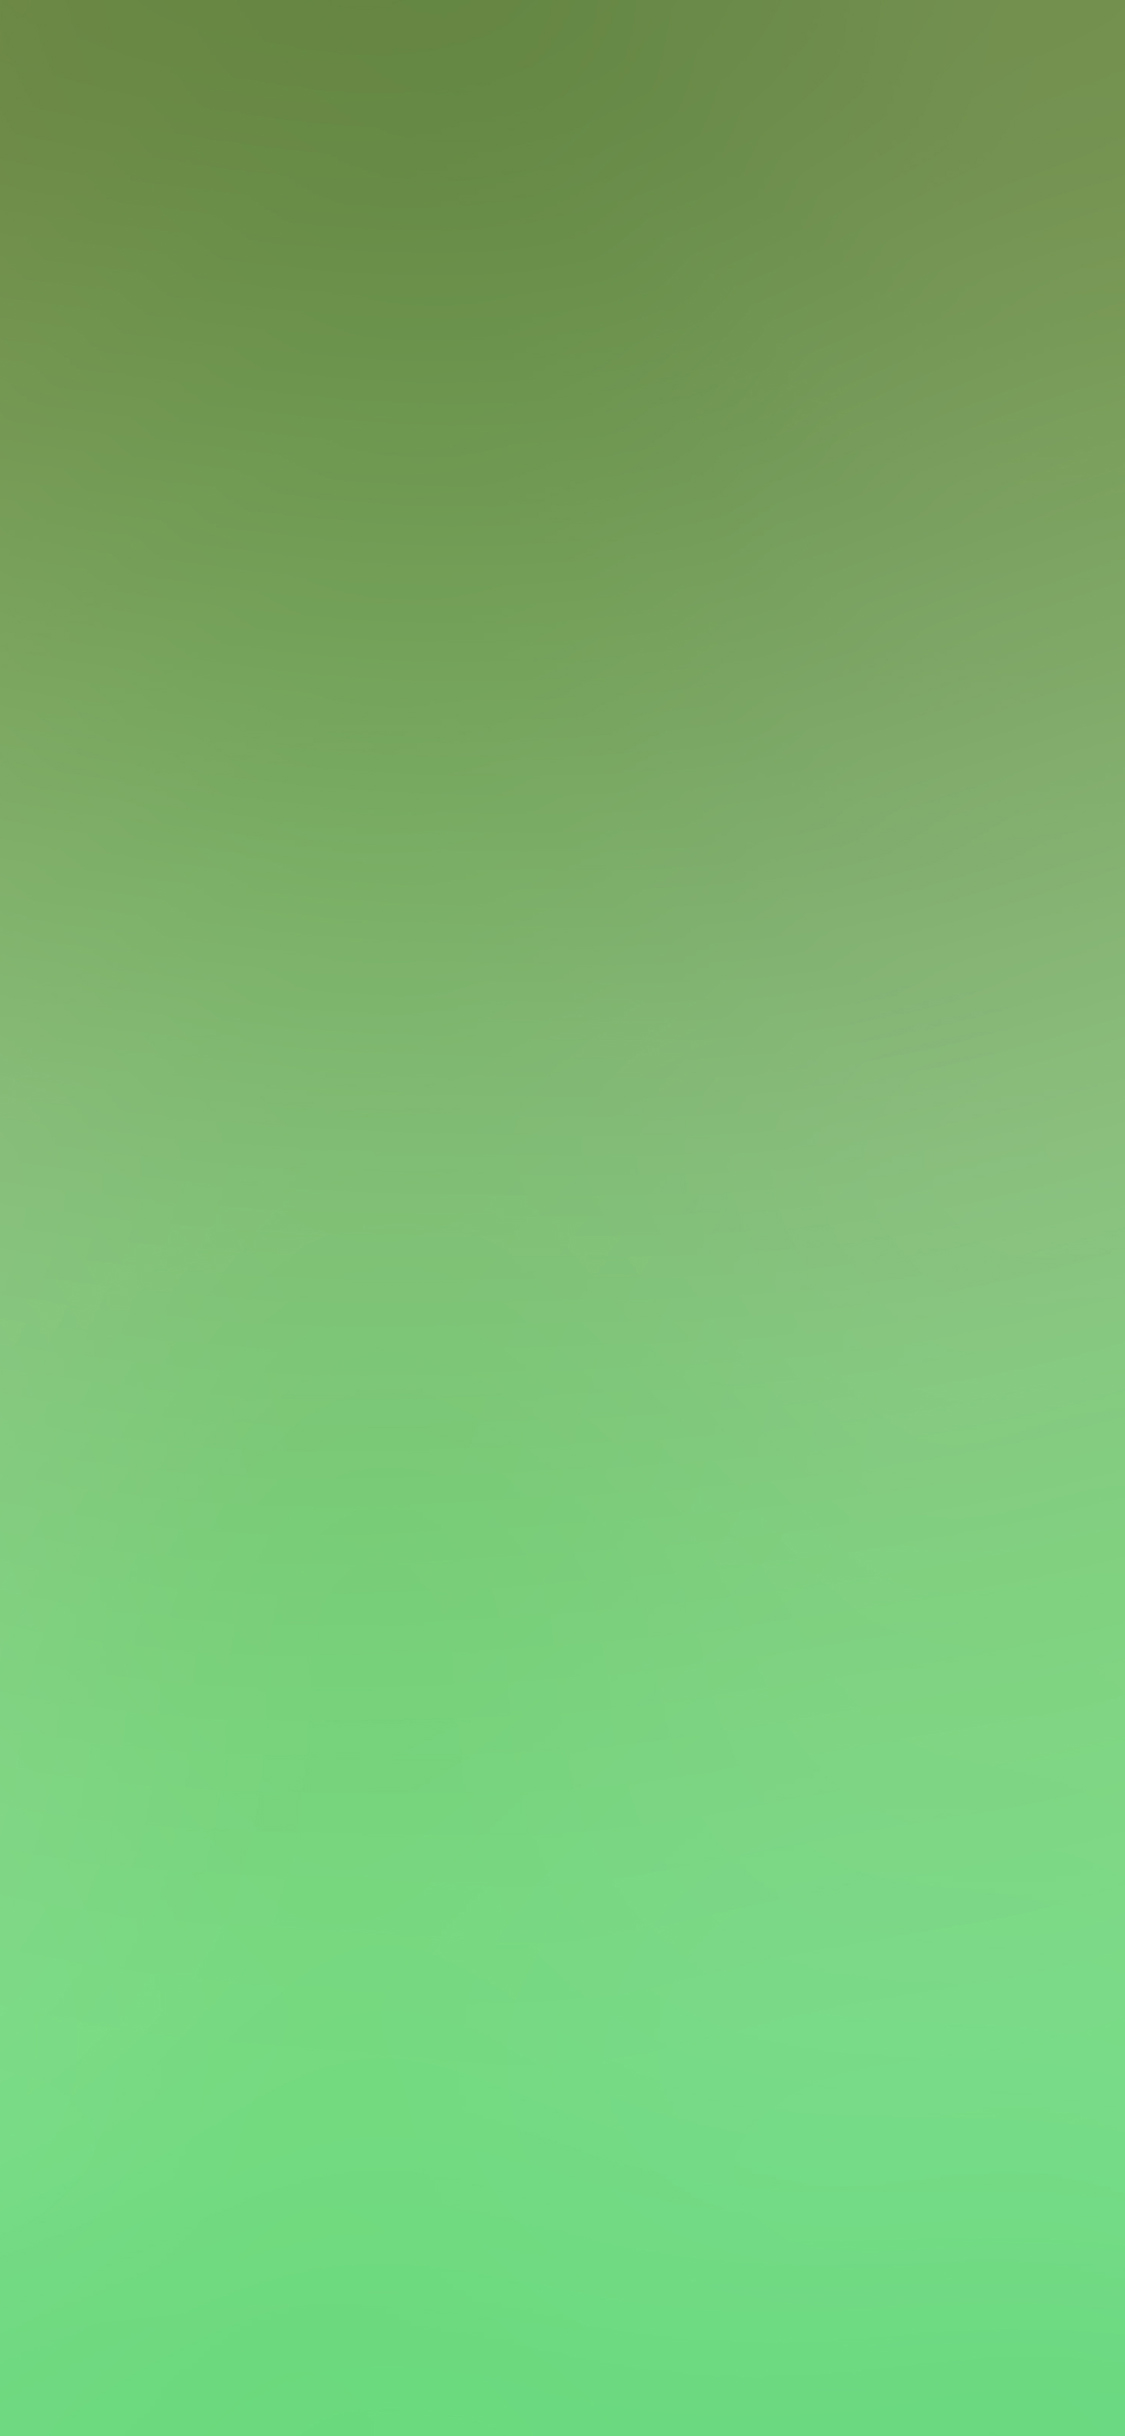 iPhoneXpapers.com-Apple-iPhone-wallpaper-sd49-emerald-green-gradation-blur